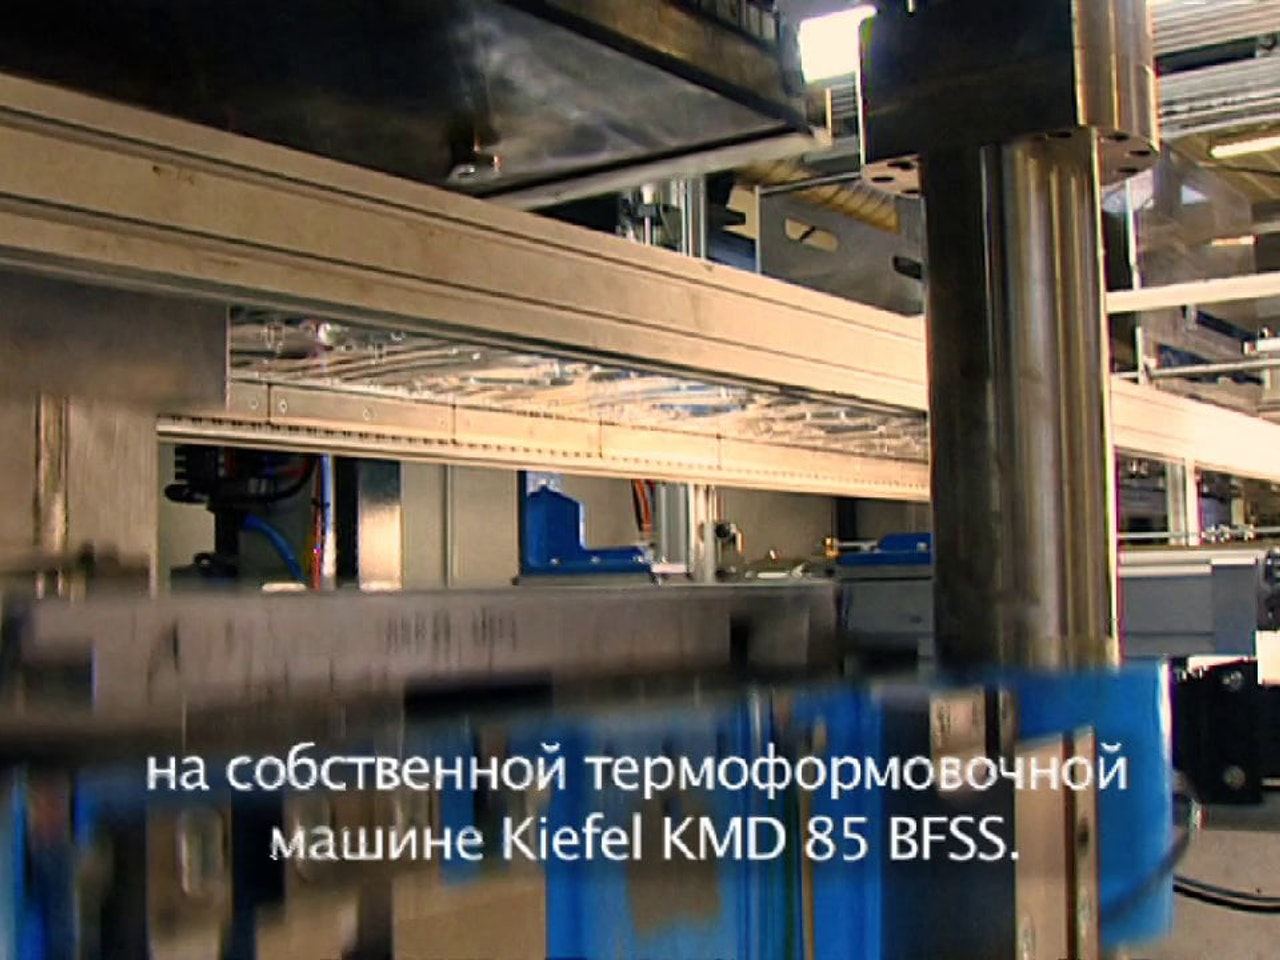 Techno tool Russian subtitles